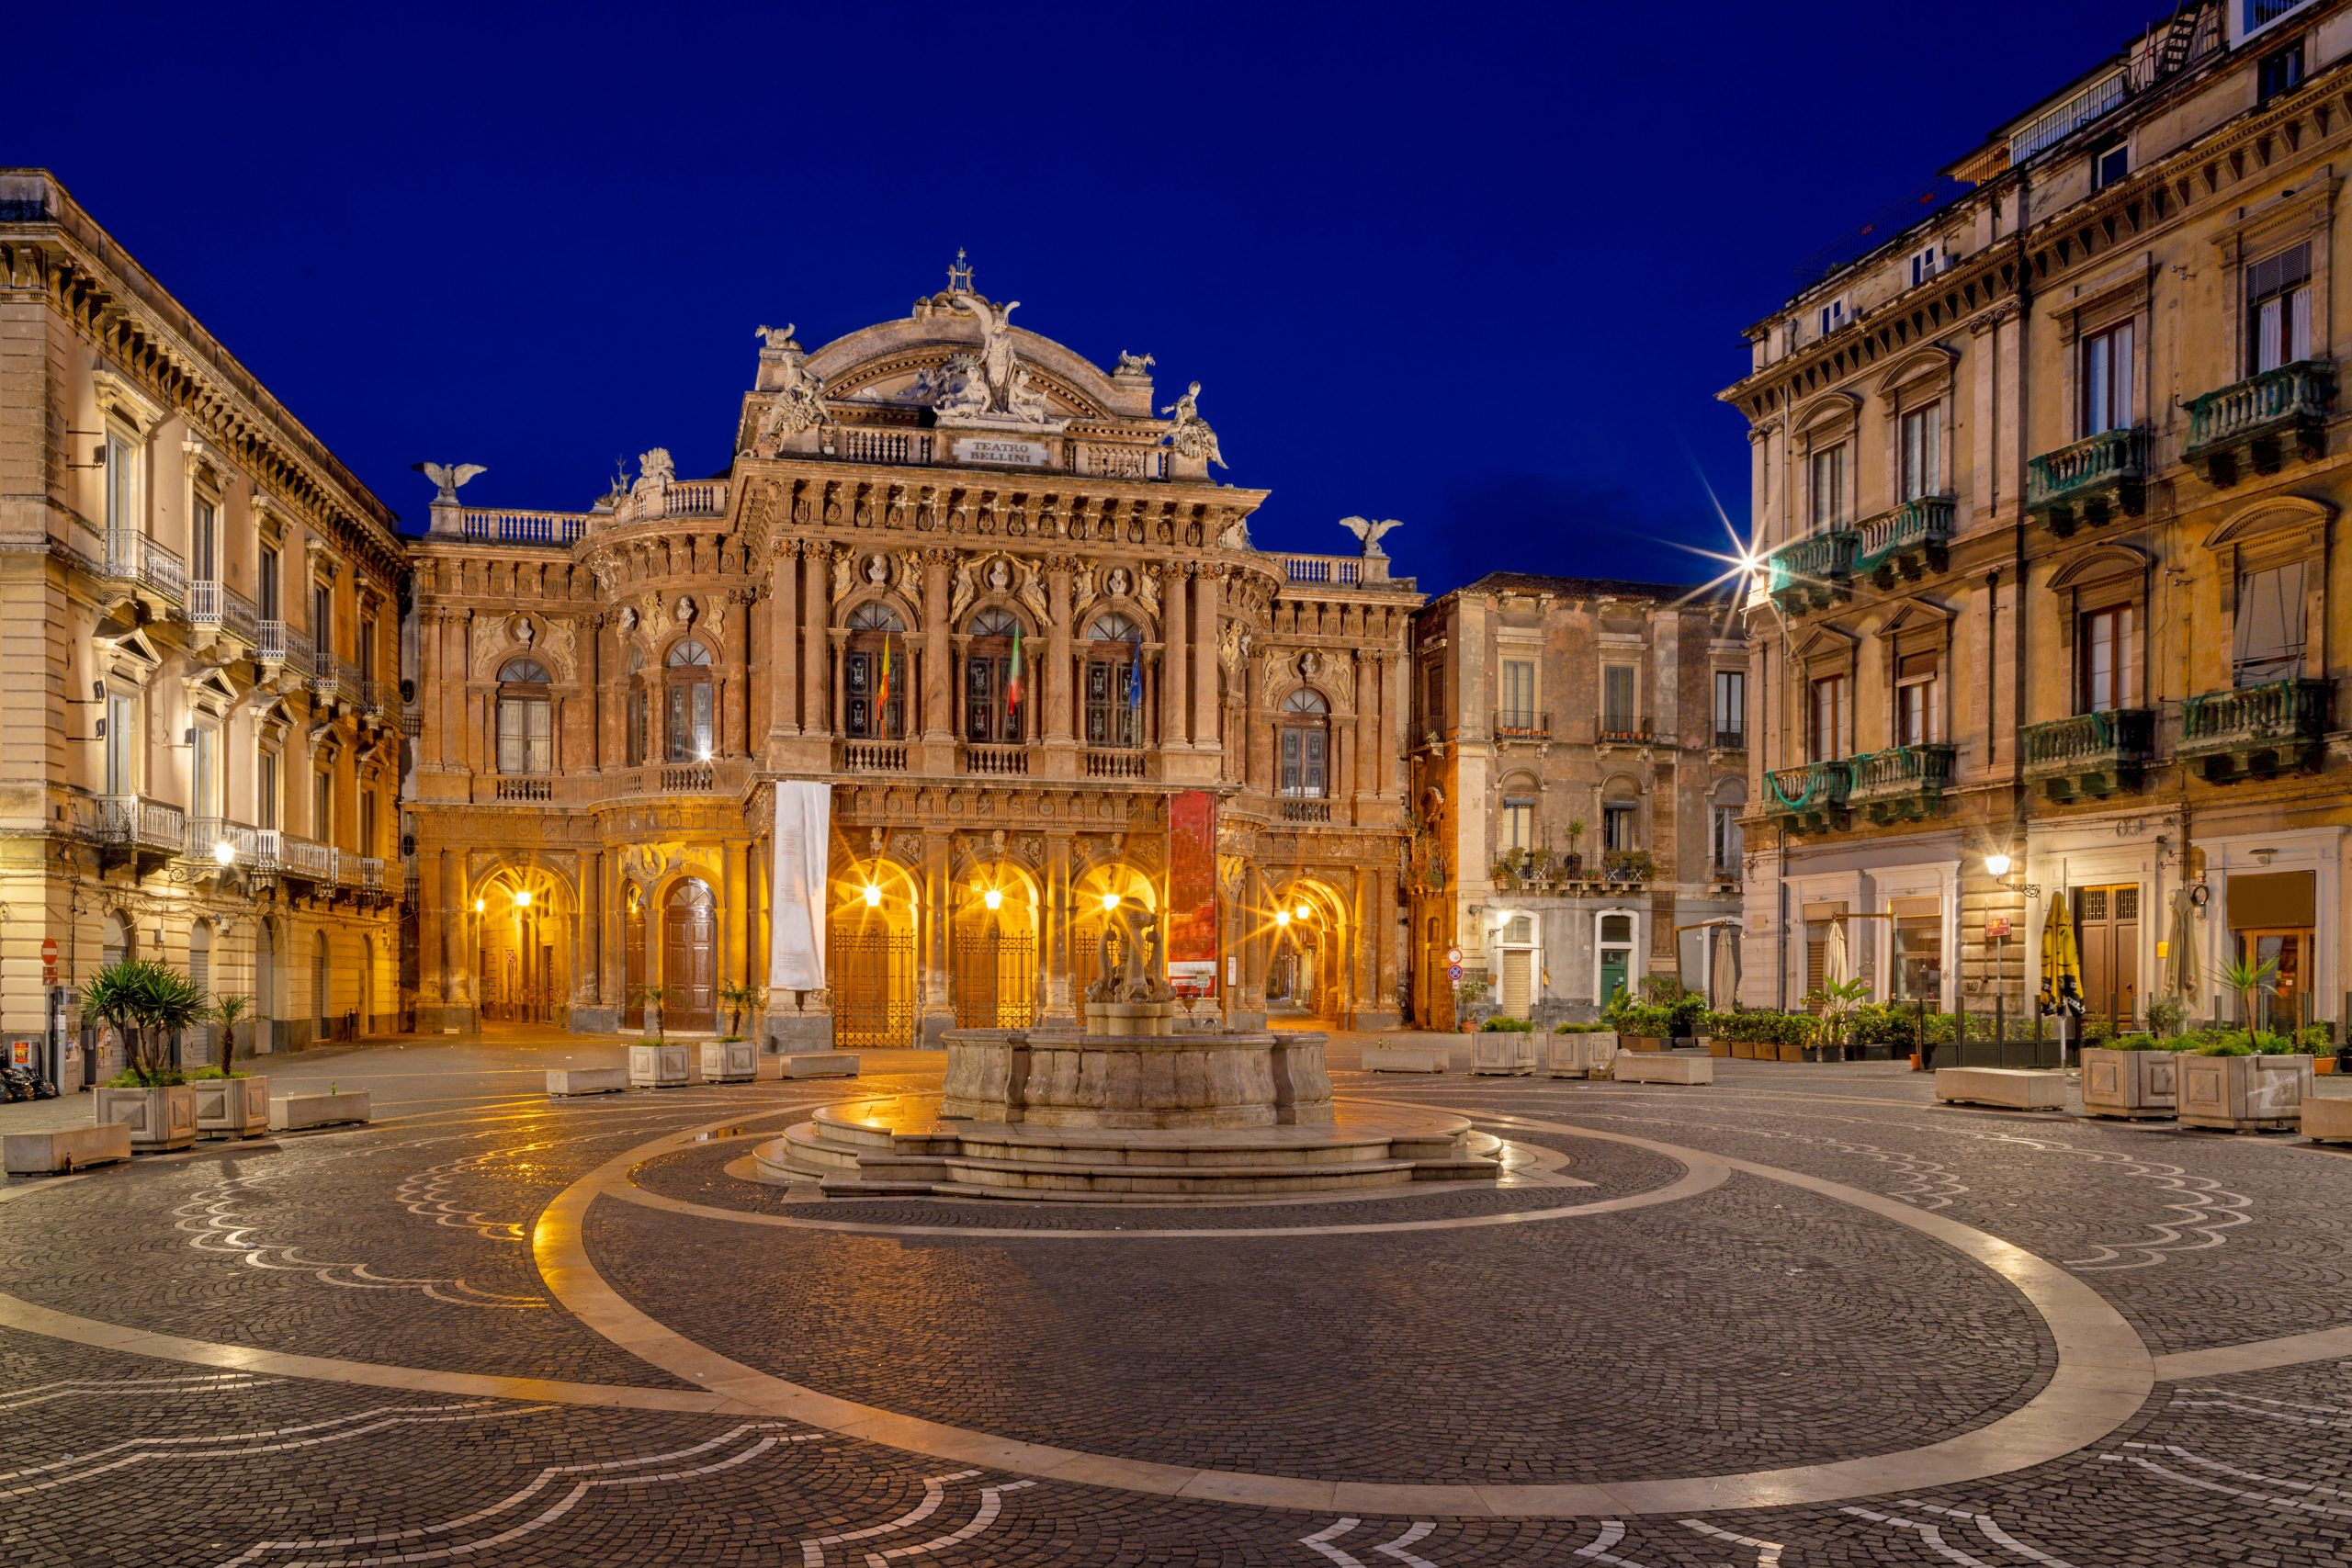 Catania - Theater - Teatro Massimo Bellini at dusk.